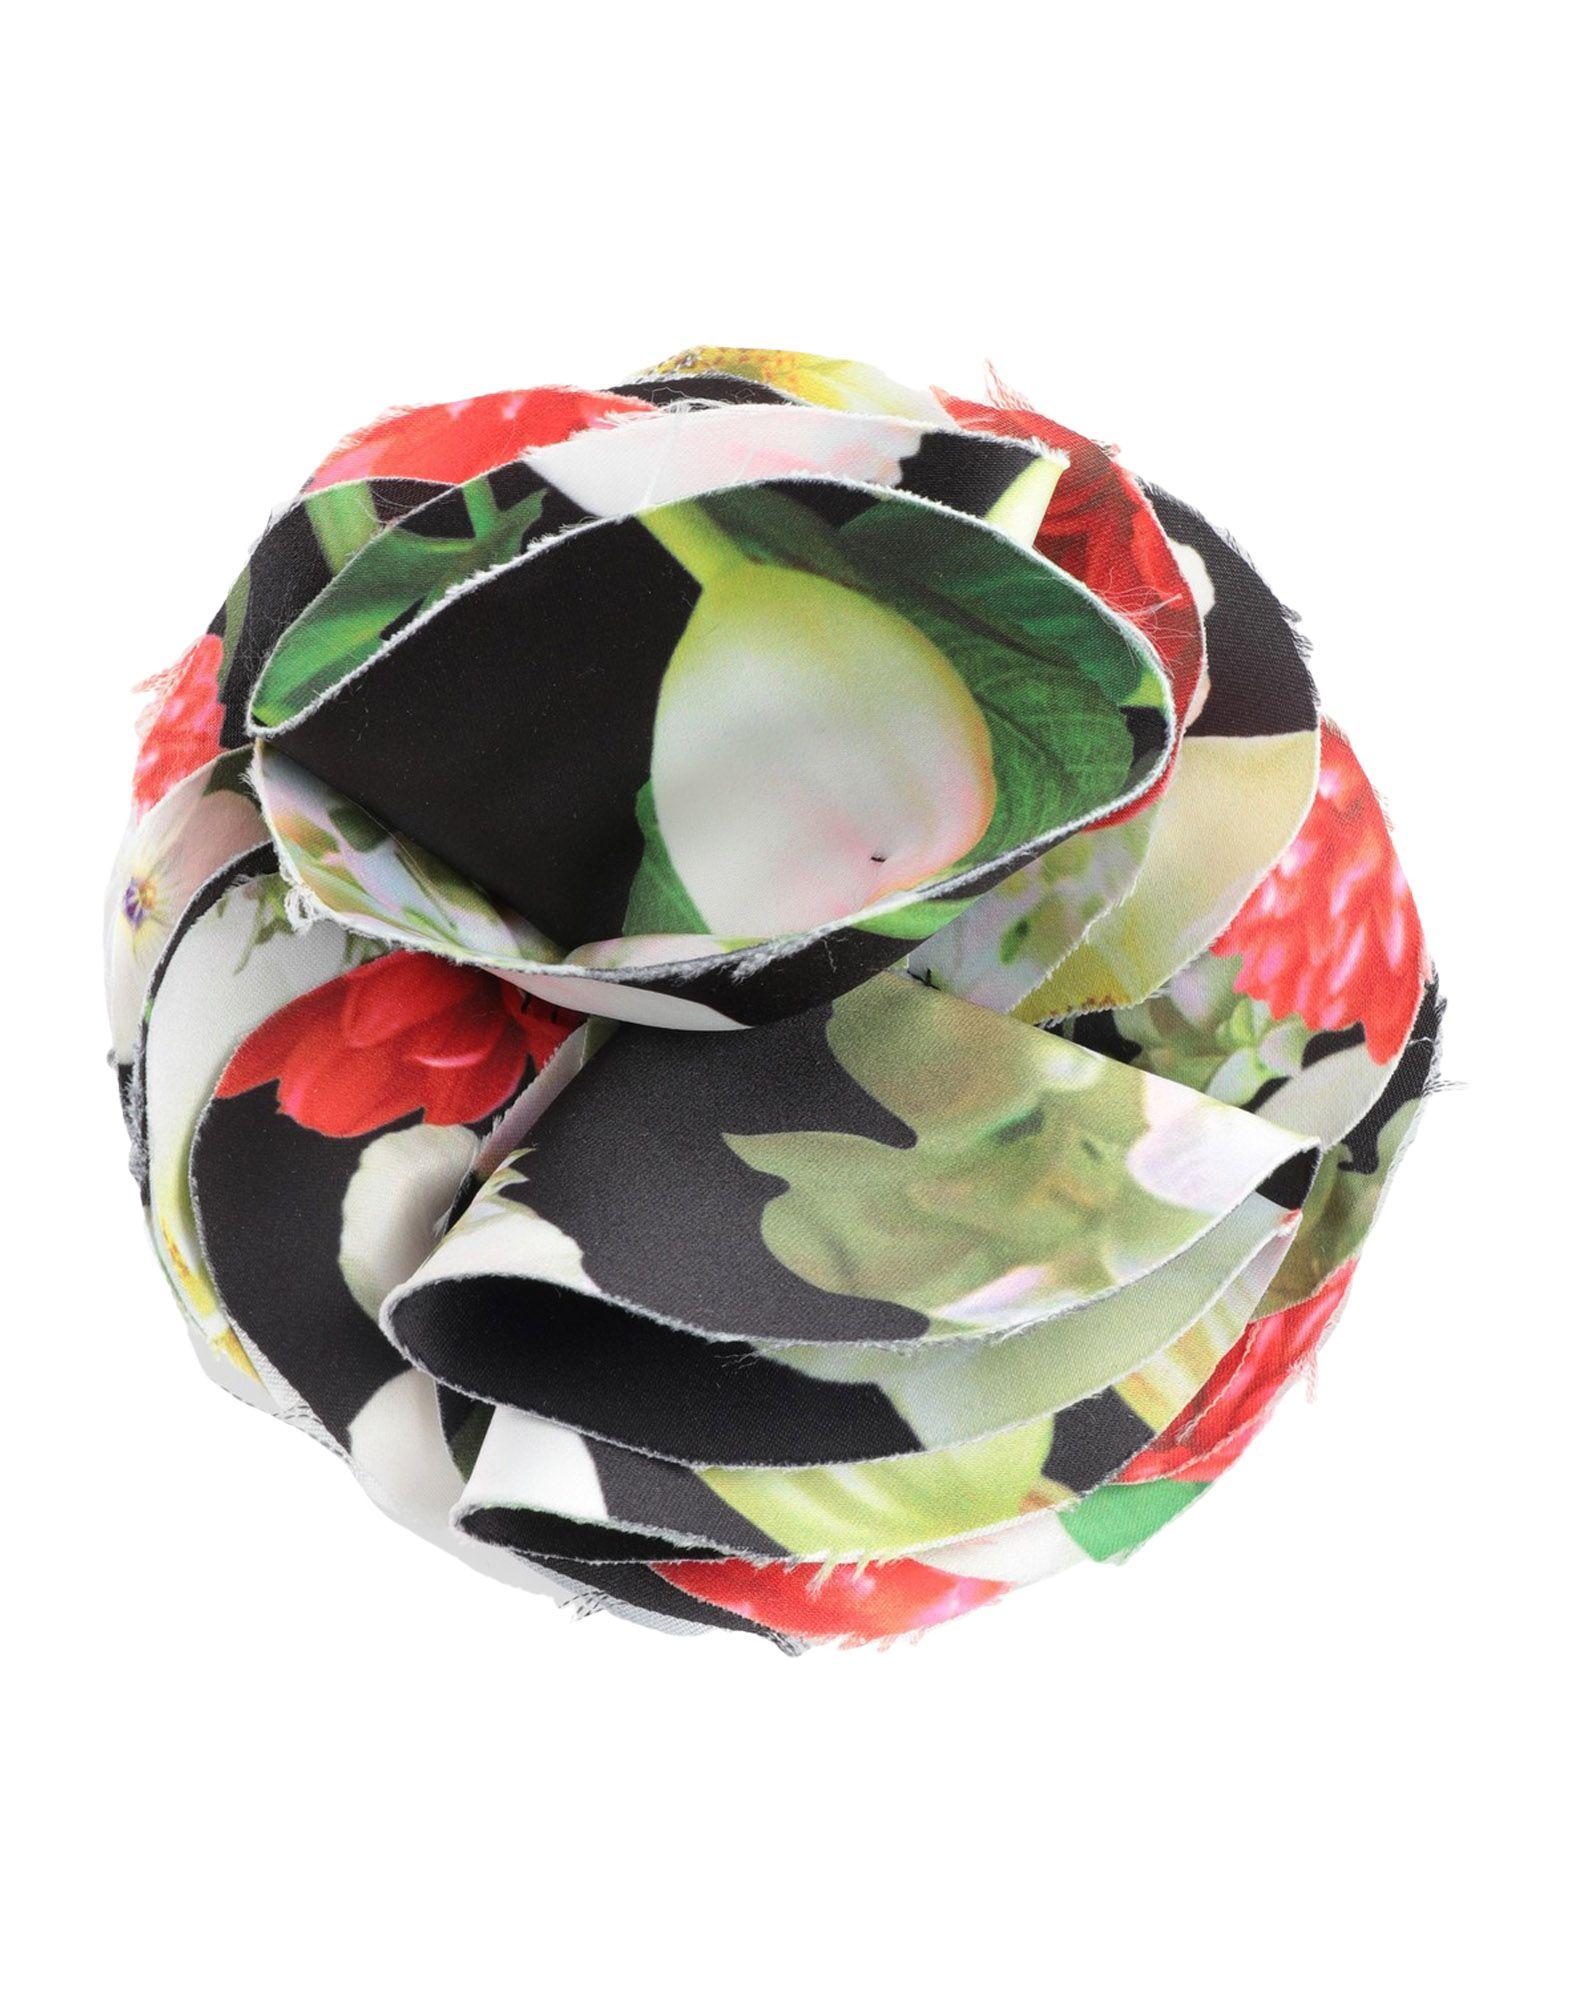 YOOX.COM(ユークス)《セール開催中》GIADA CURTI RESORT レディース ブローチ グリーン 紡績繊維